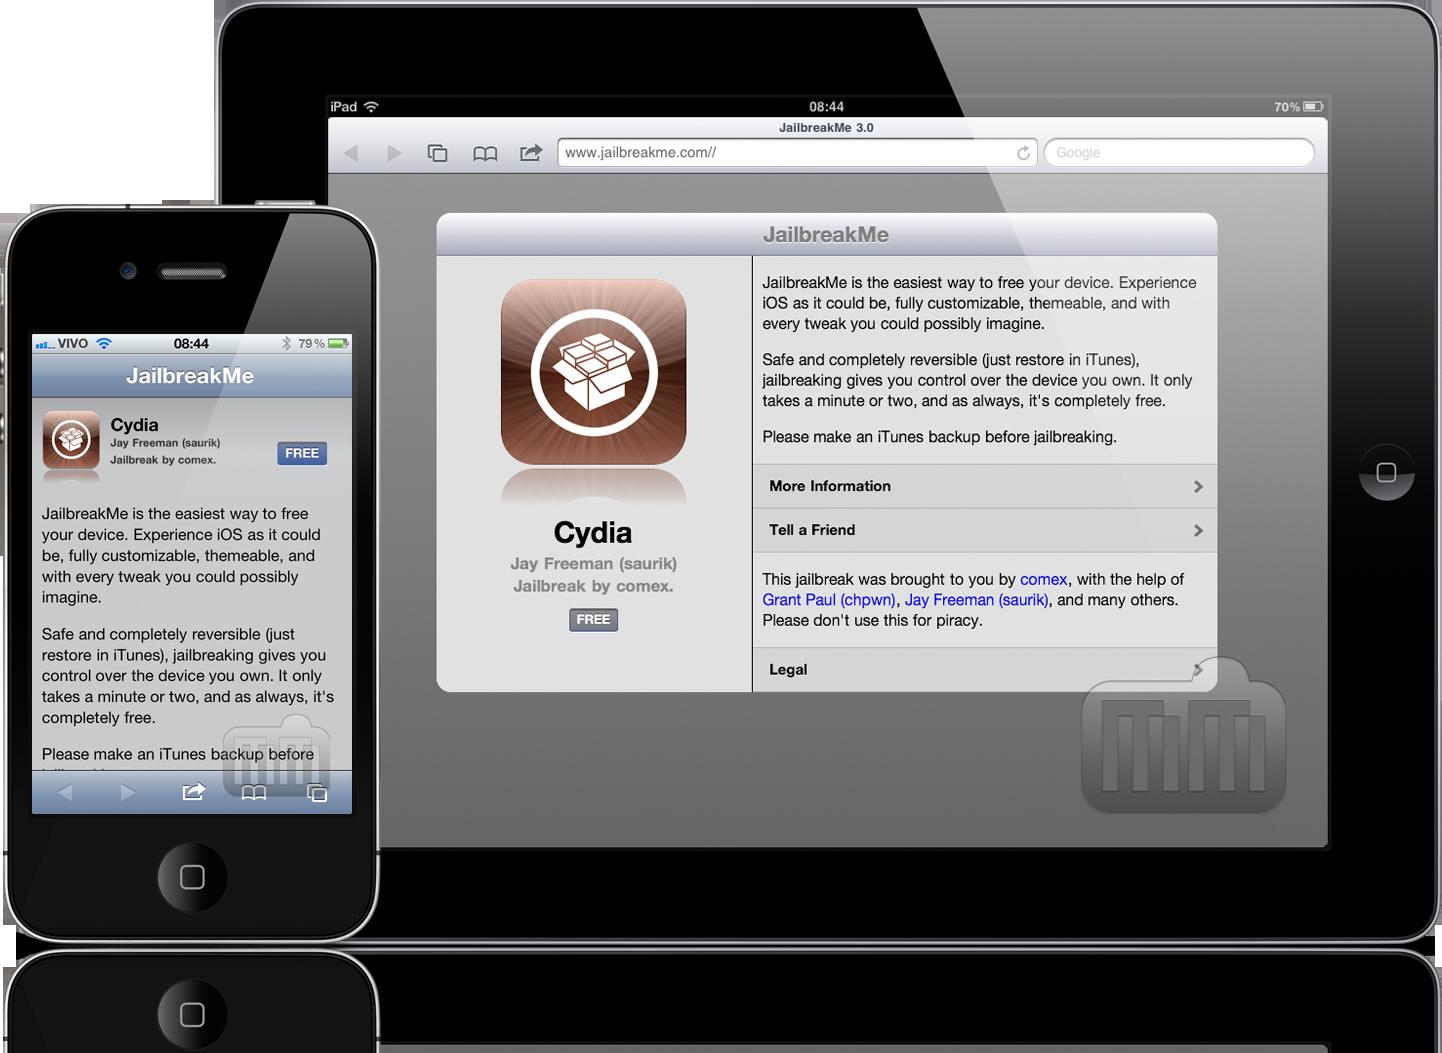 JailbreakMe 3.0 em iPad e iPhone